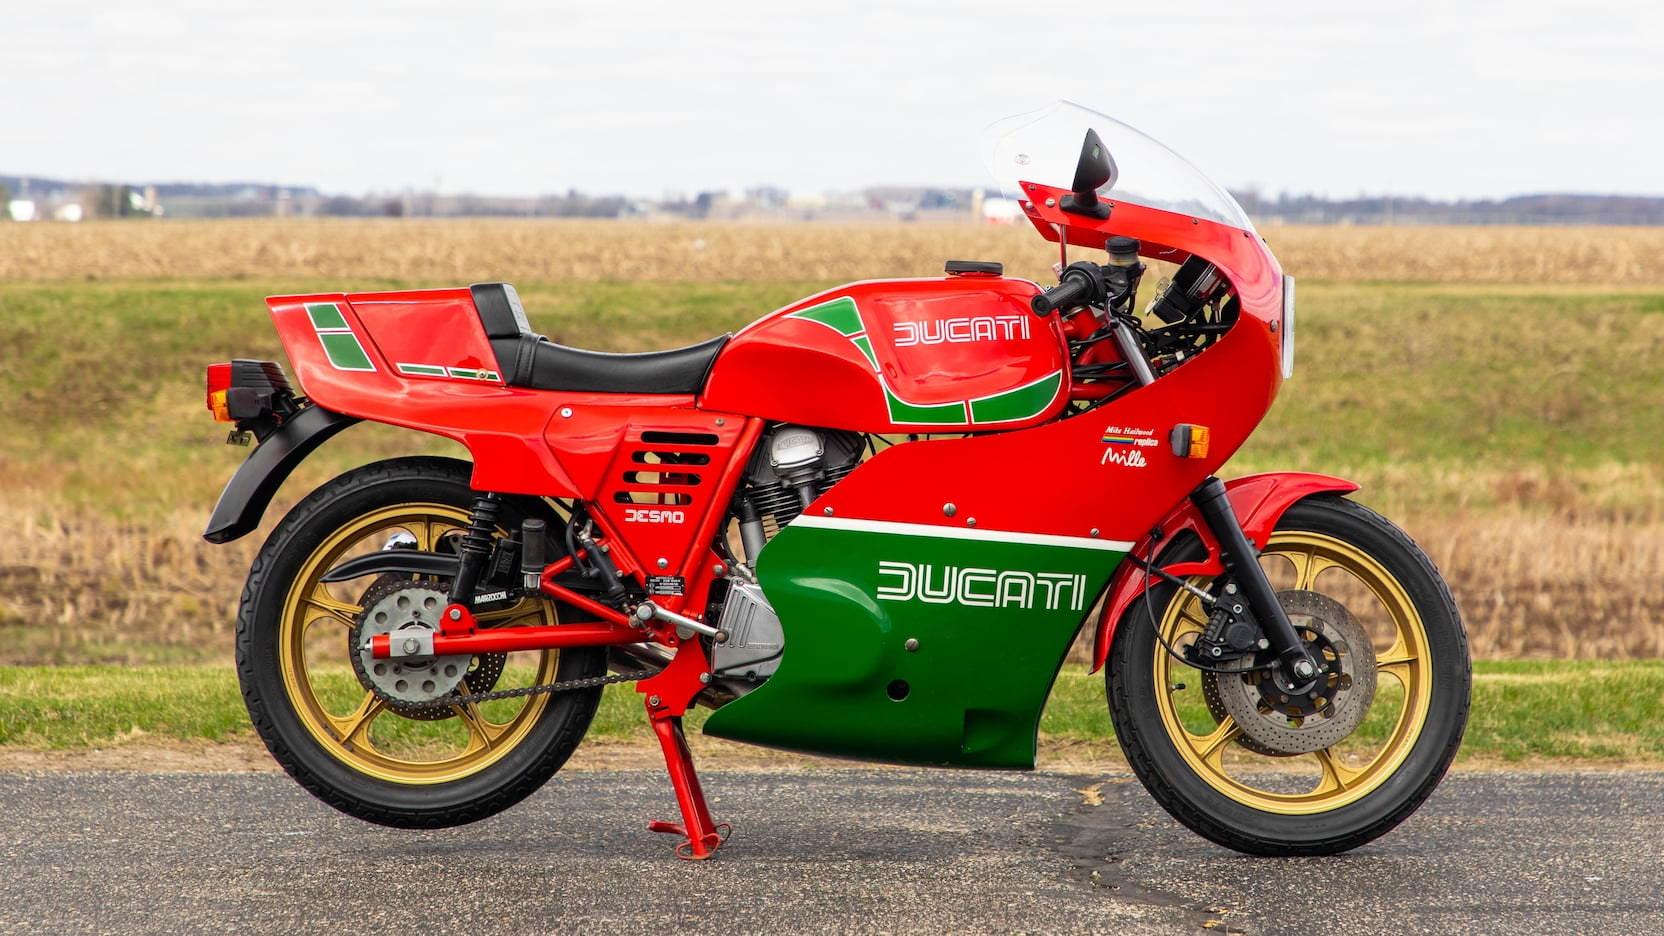 Ducati Mike Hailwood Replica - MHR Mille Side